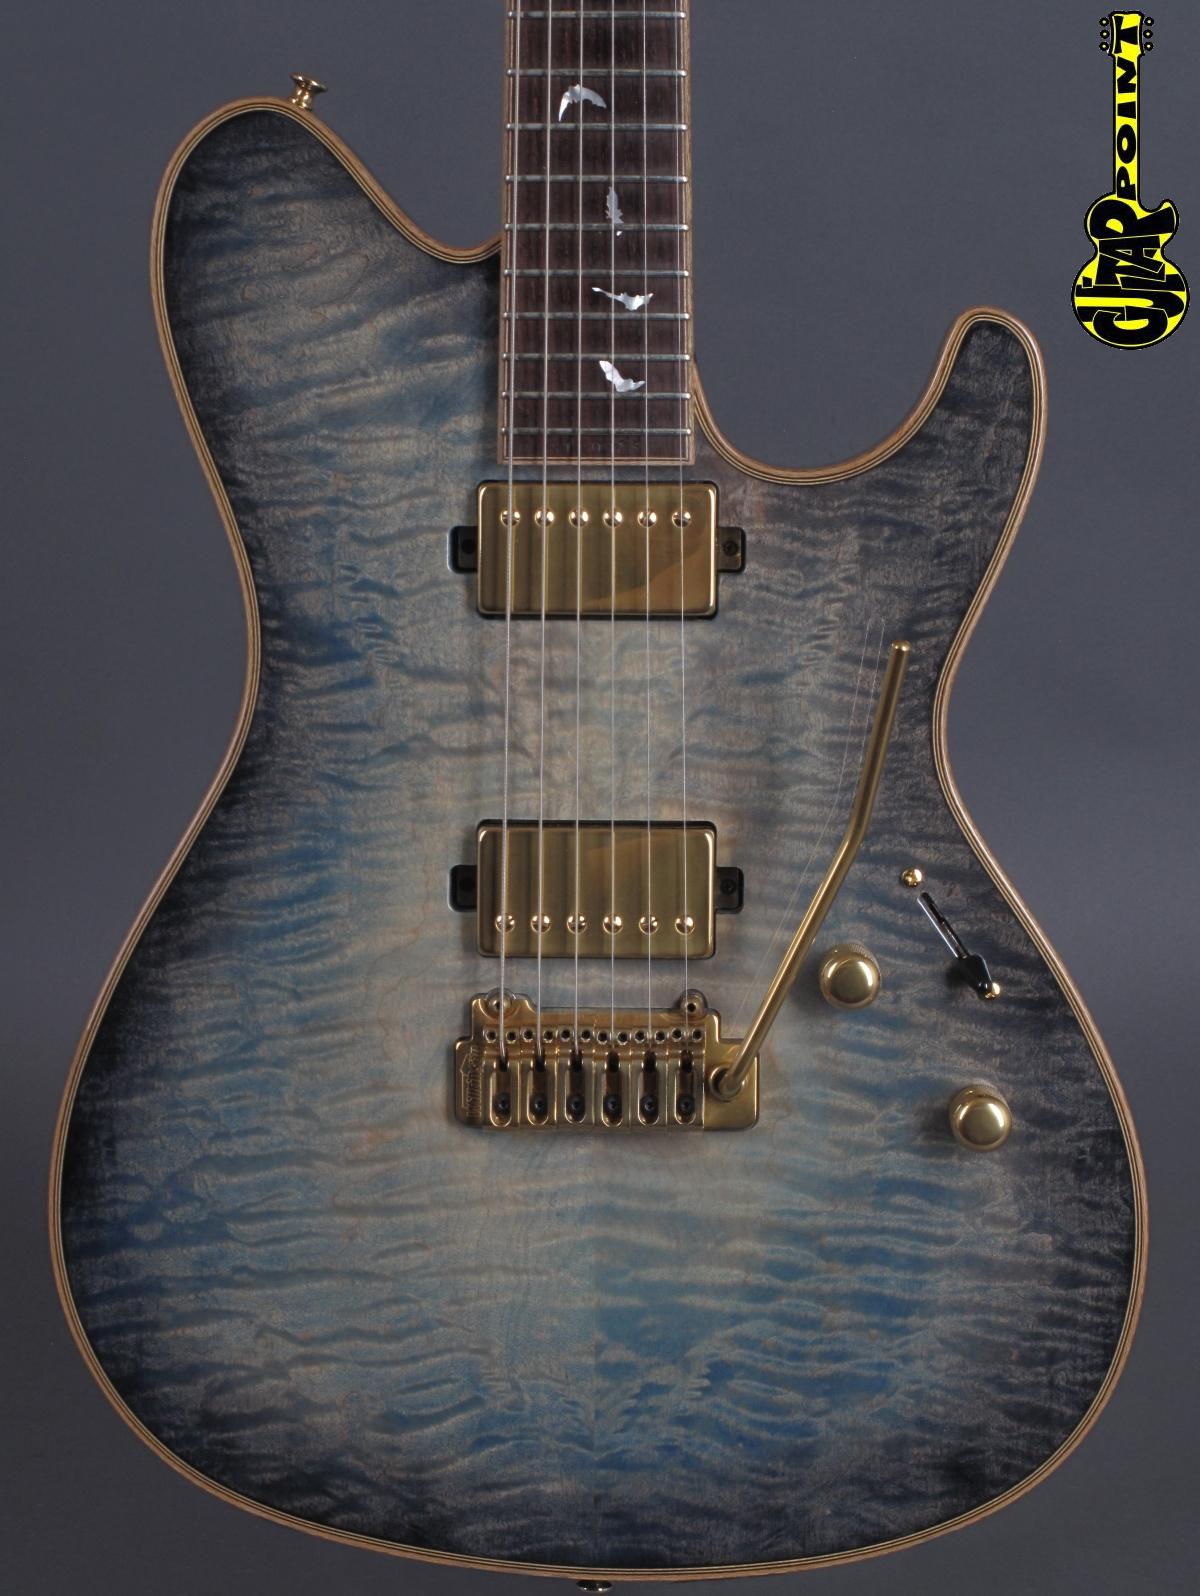 Sugi Model DS500 C EM/AT - Transparent Blue